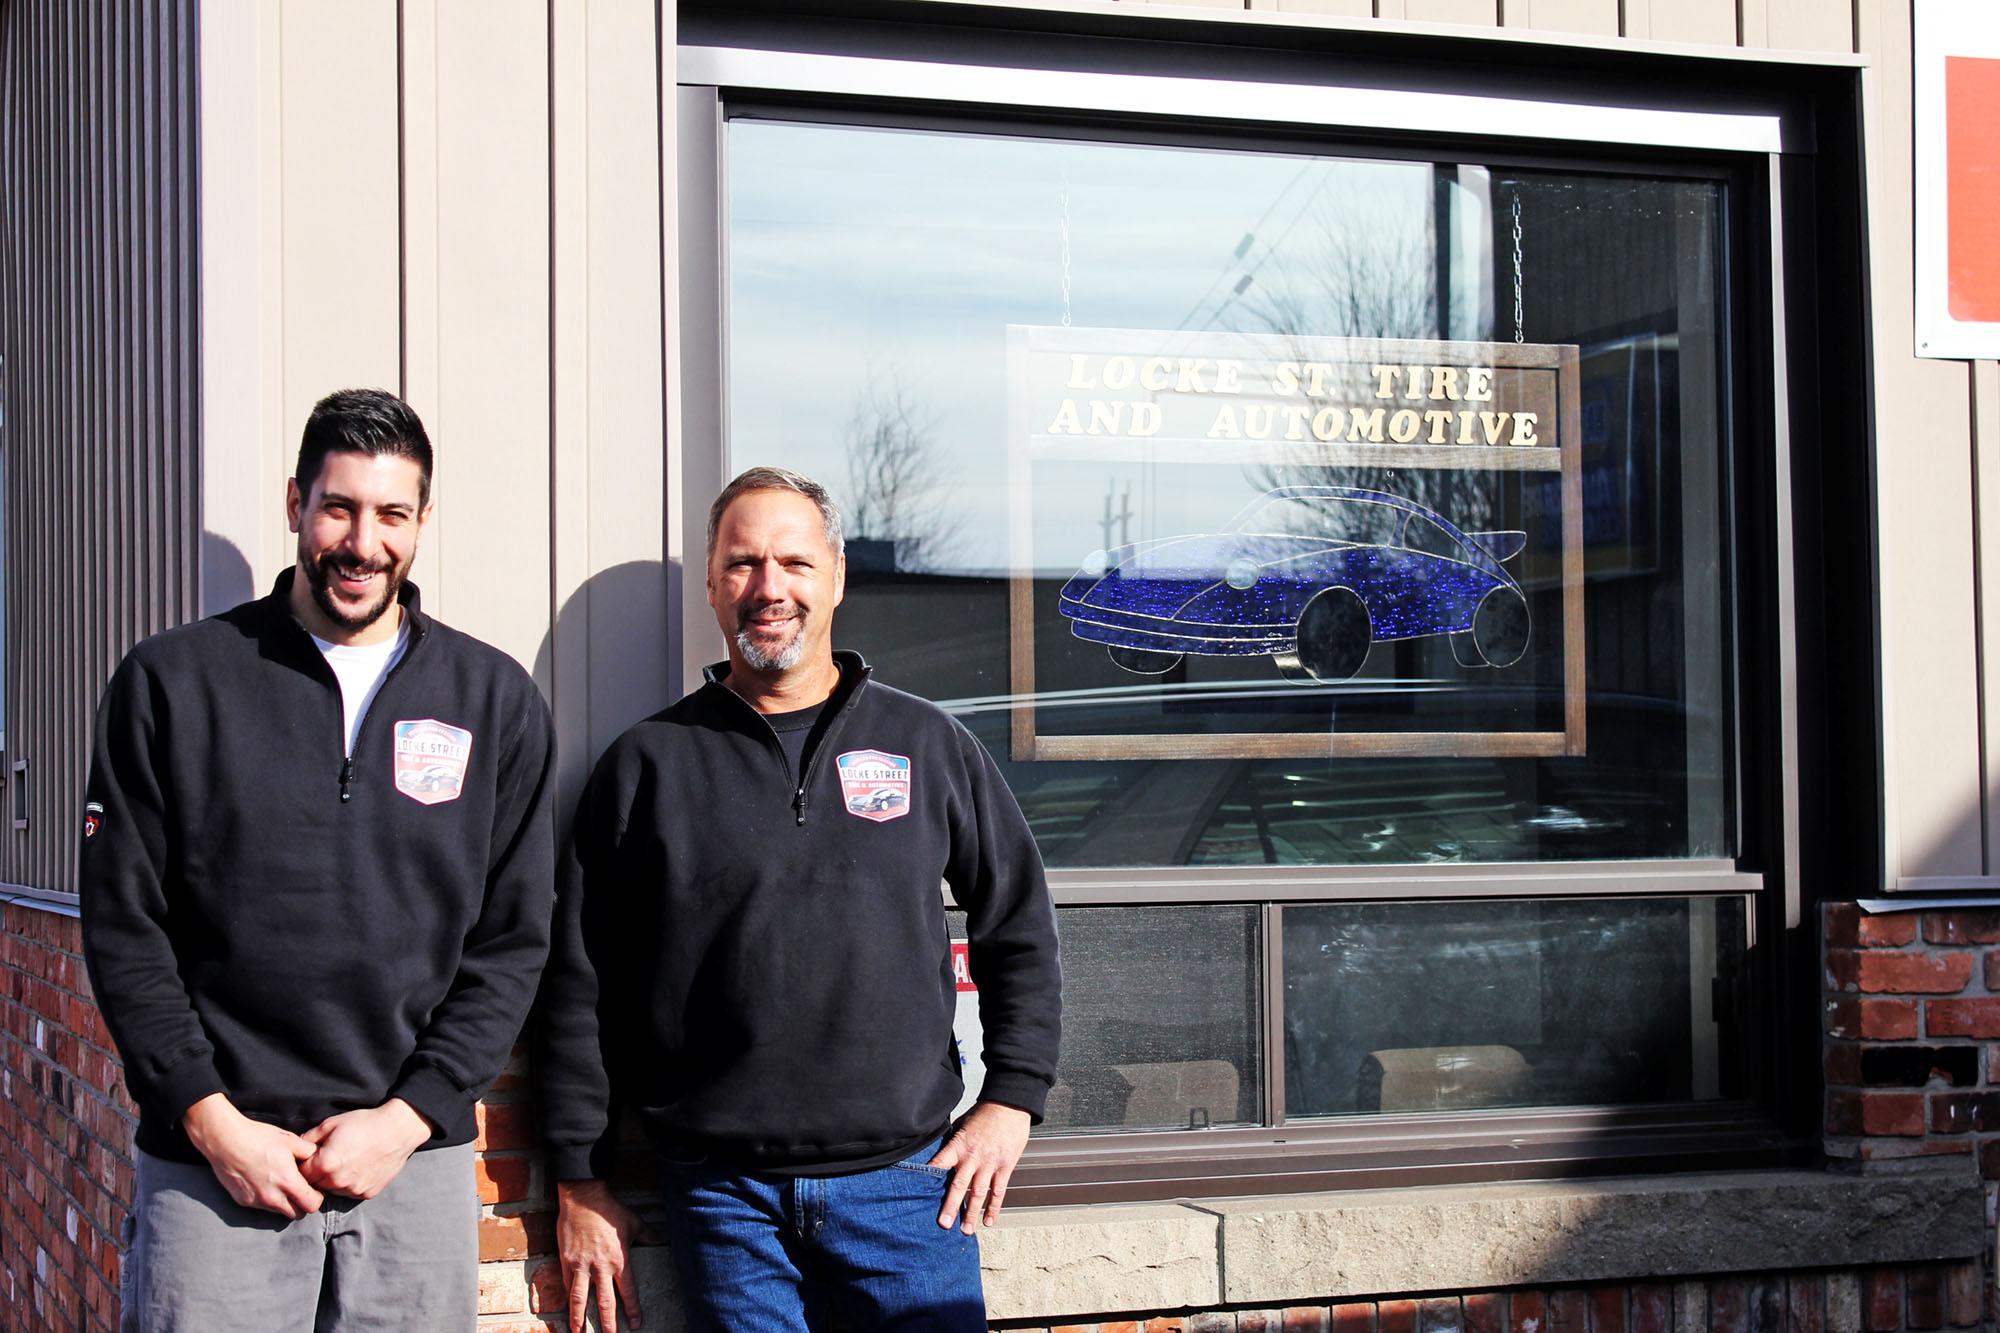 James Maida & Robert Bernacci outside Locke Street Tire & Automotive